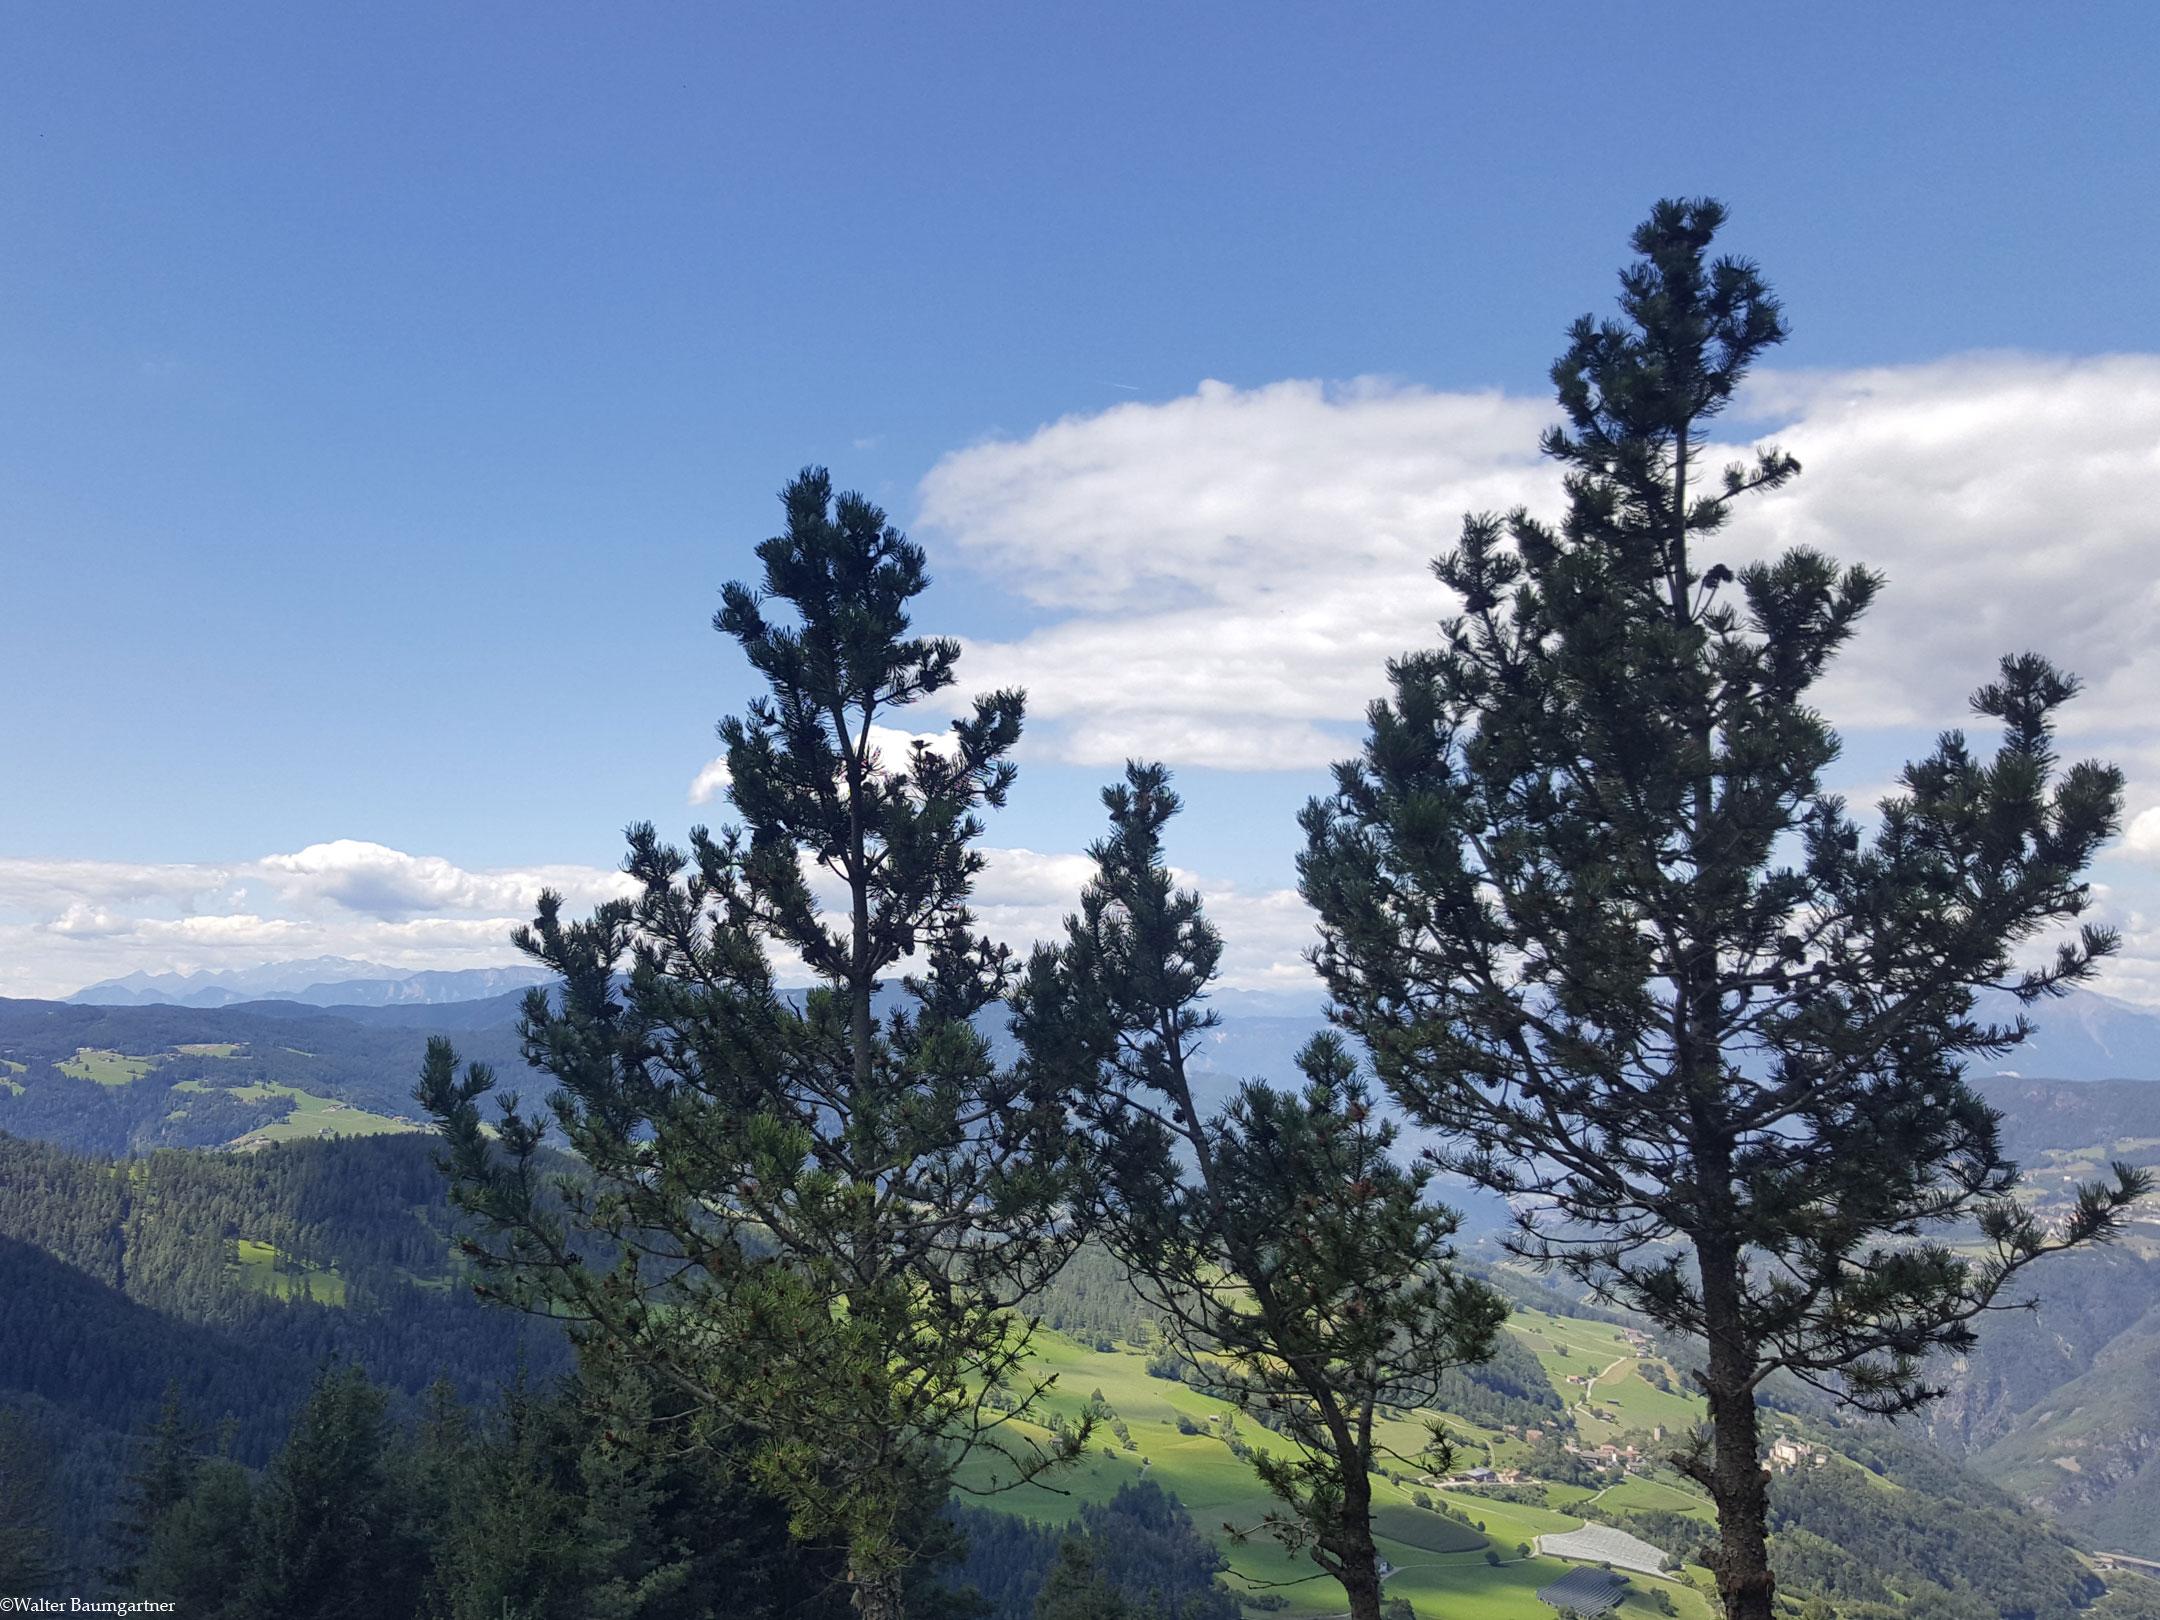 Wheelchair-Tours-Rollstuhl-Hofer-Alpl-Aussicht-Terrasse